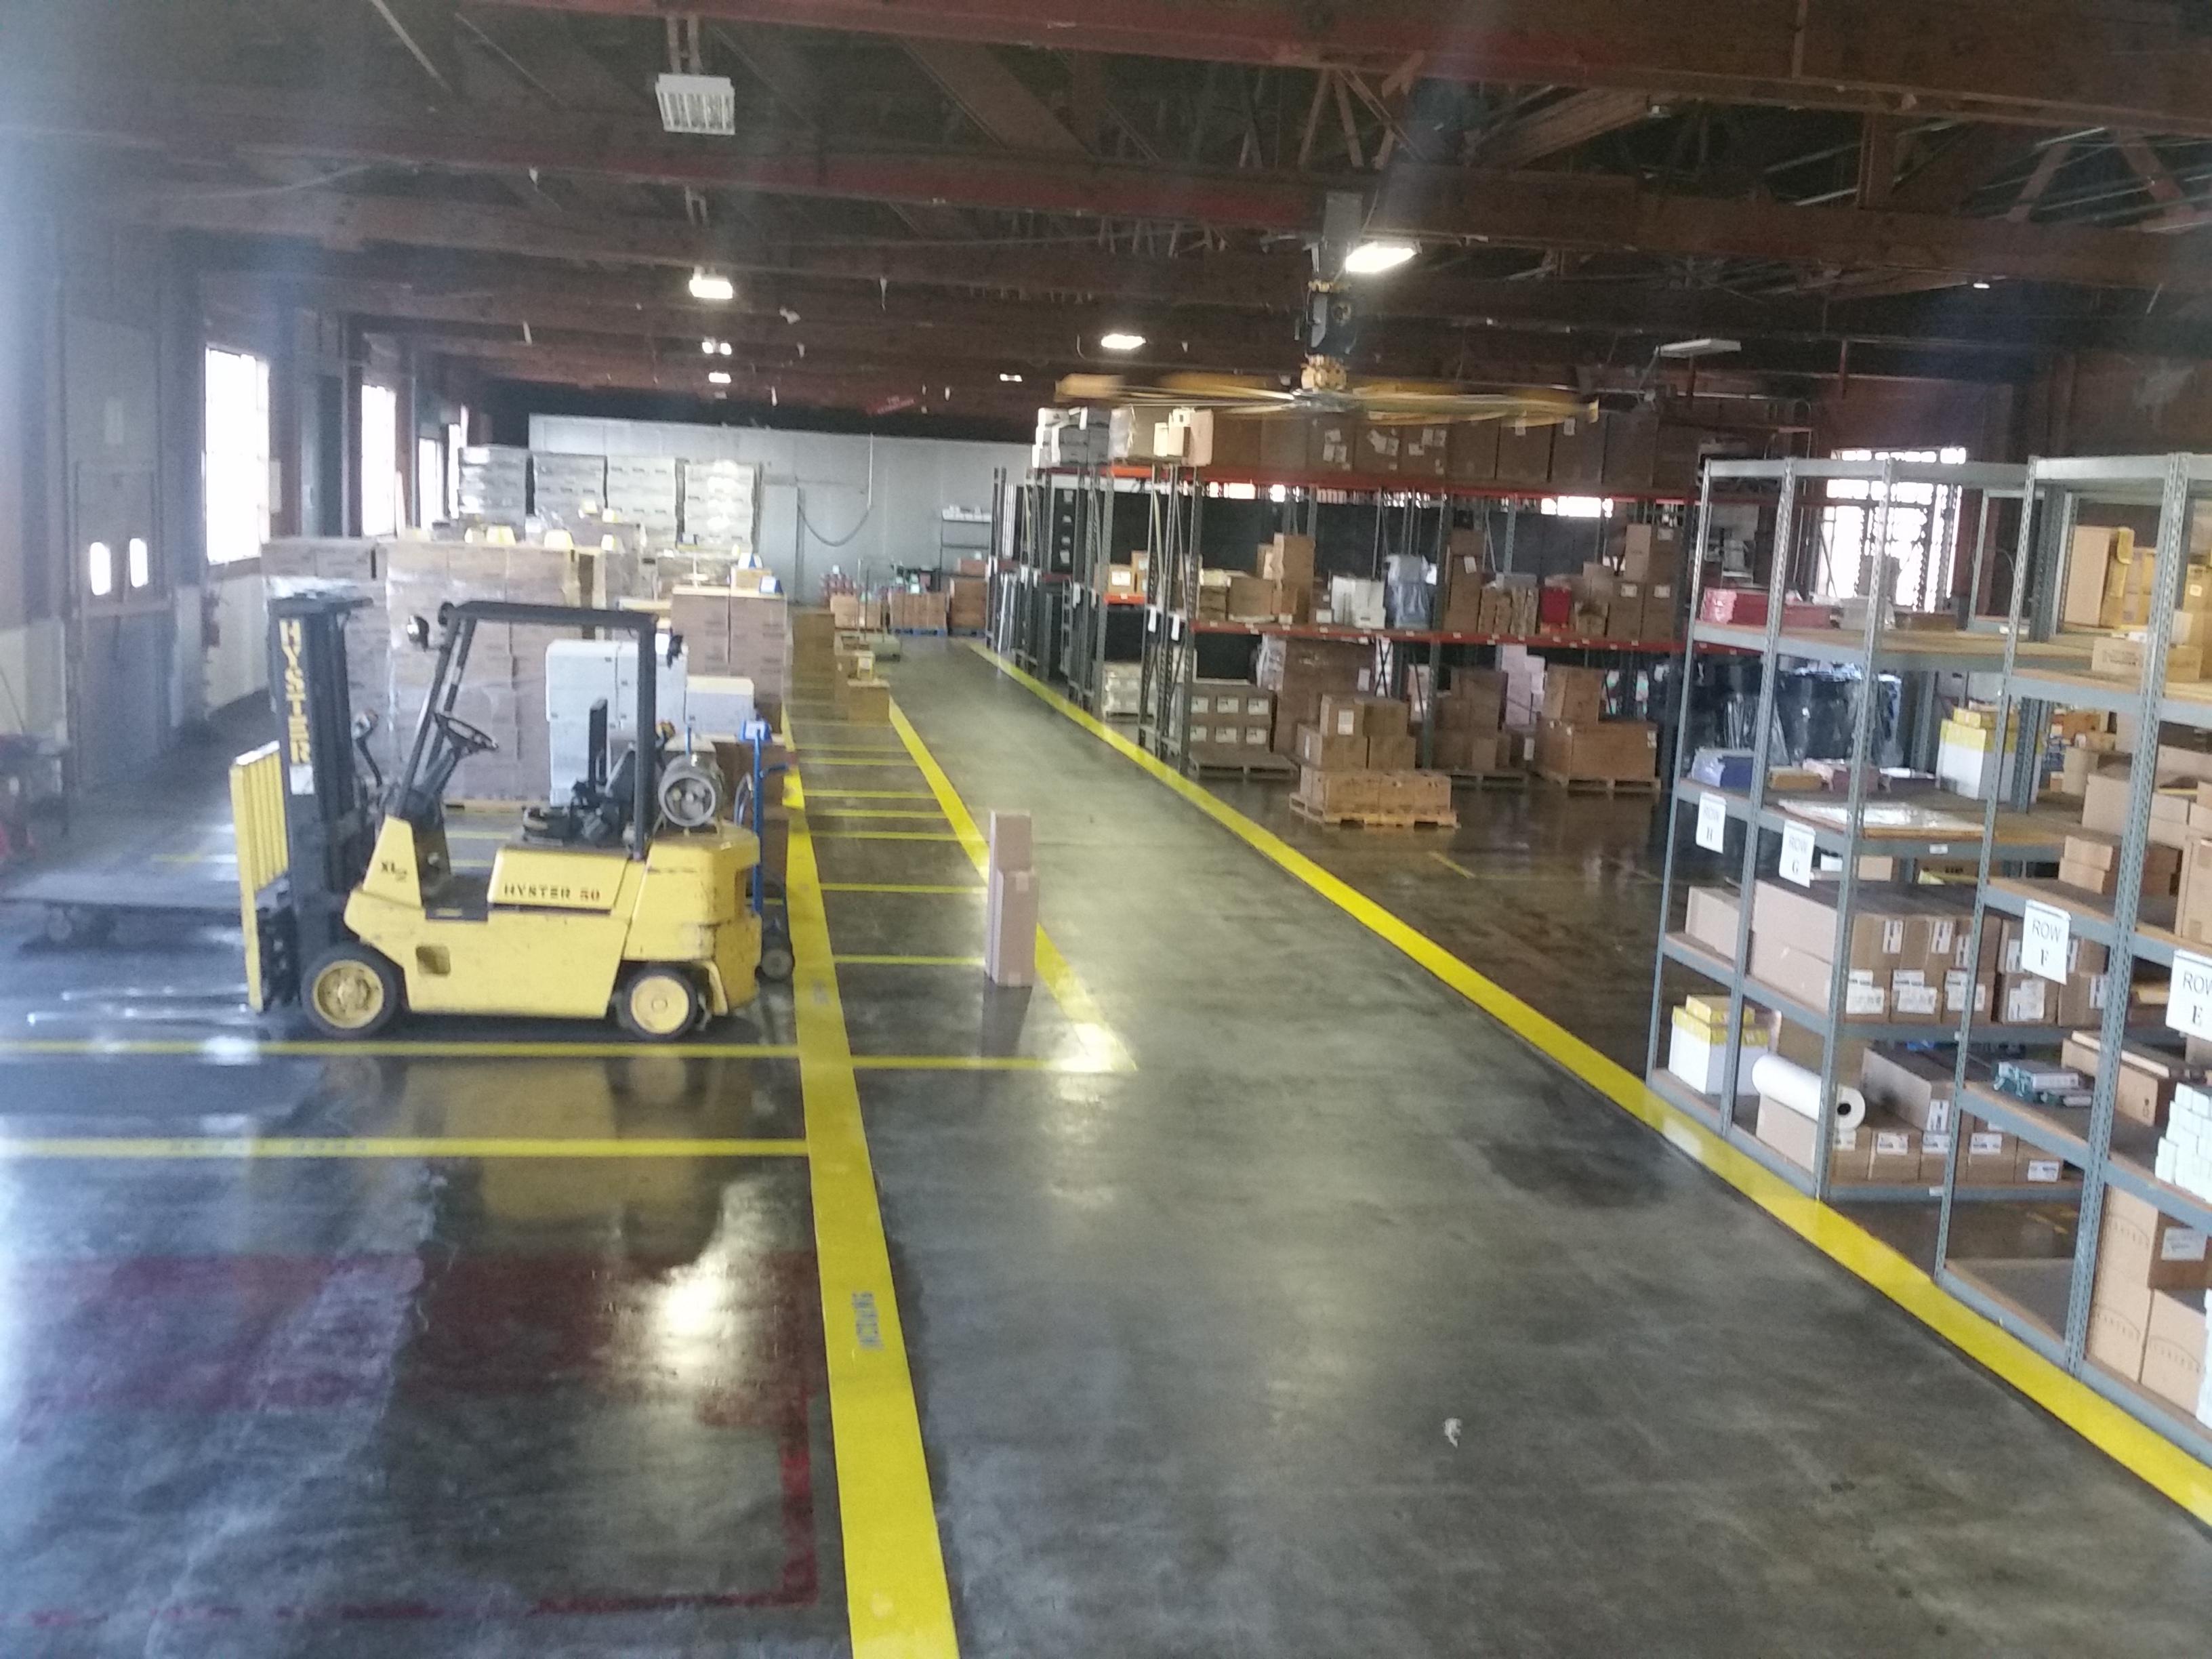 Image: Warehouse storage items